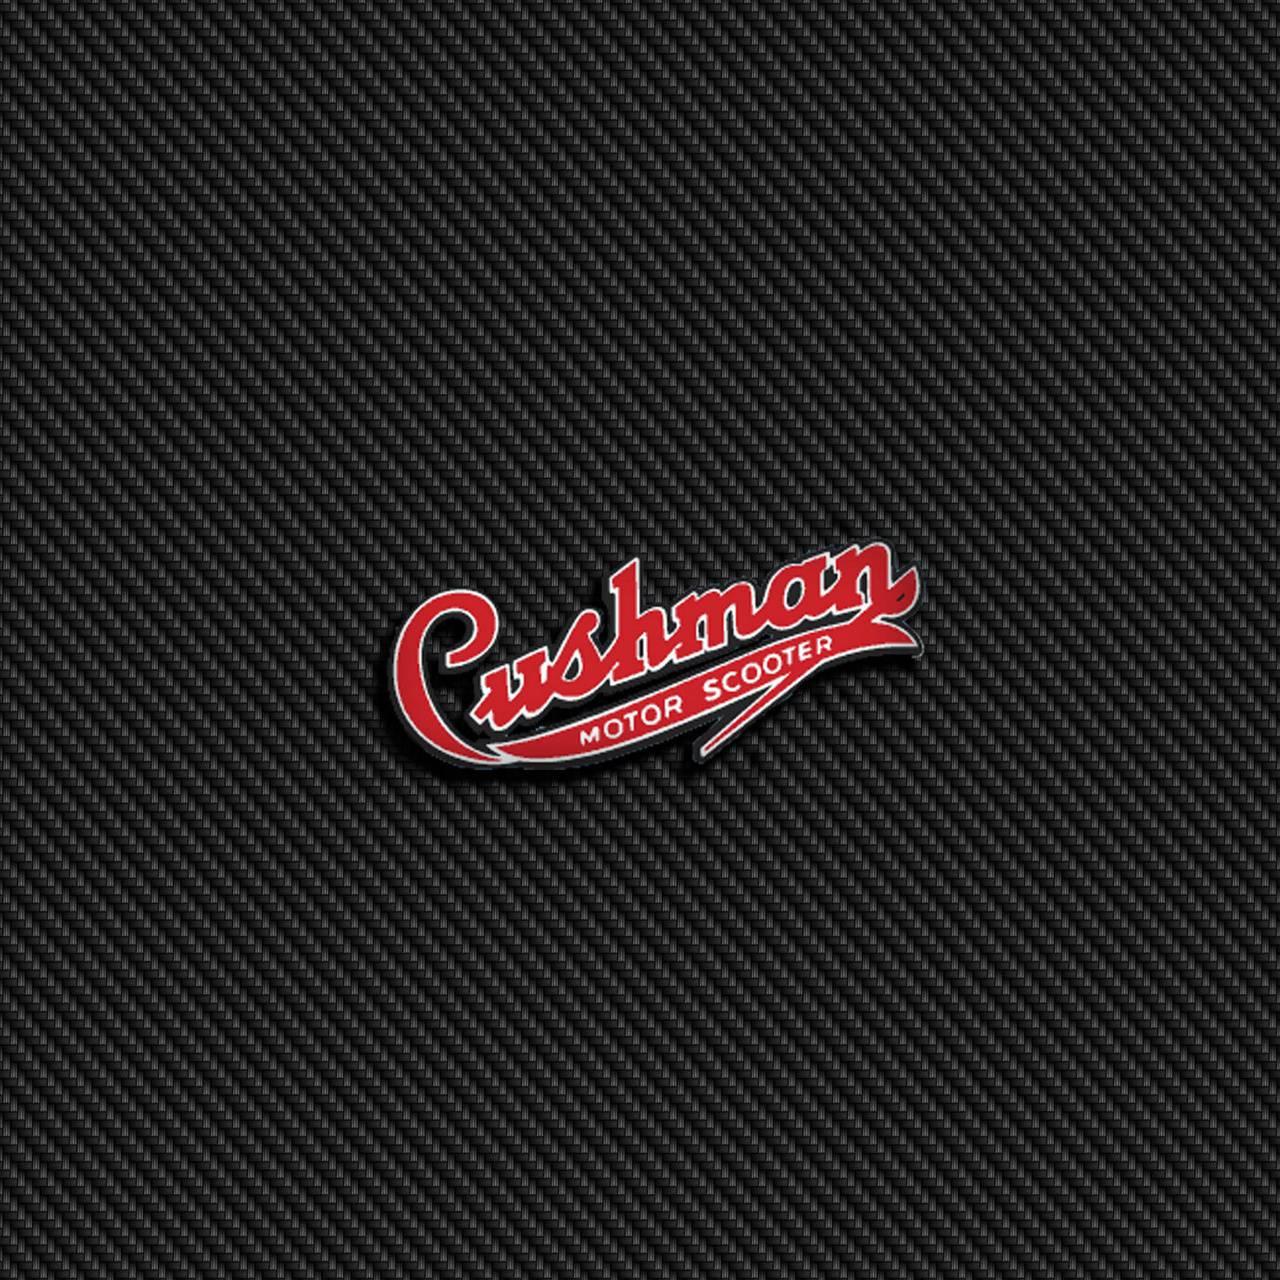 Cushman Carbon